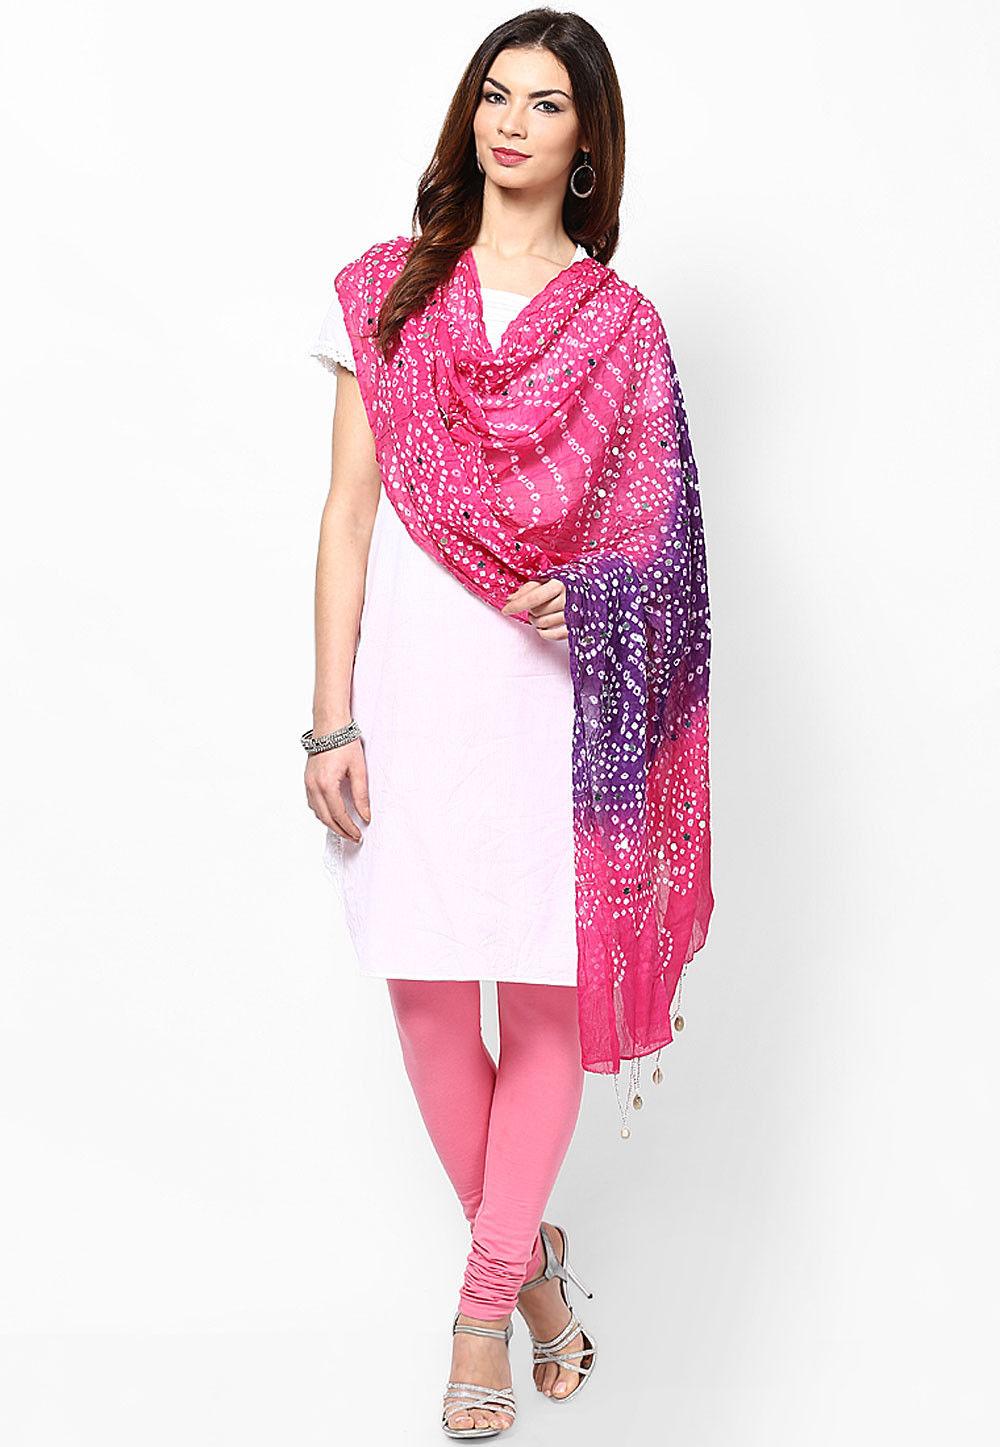 Bandhani Printed Cotton Dupatta in Fuchsia and Purple